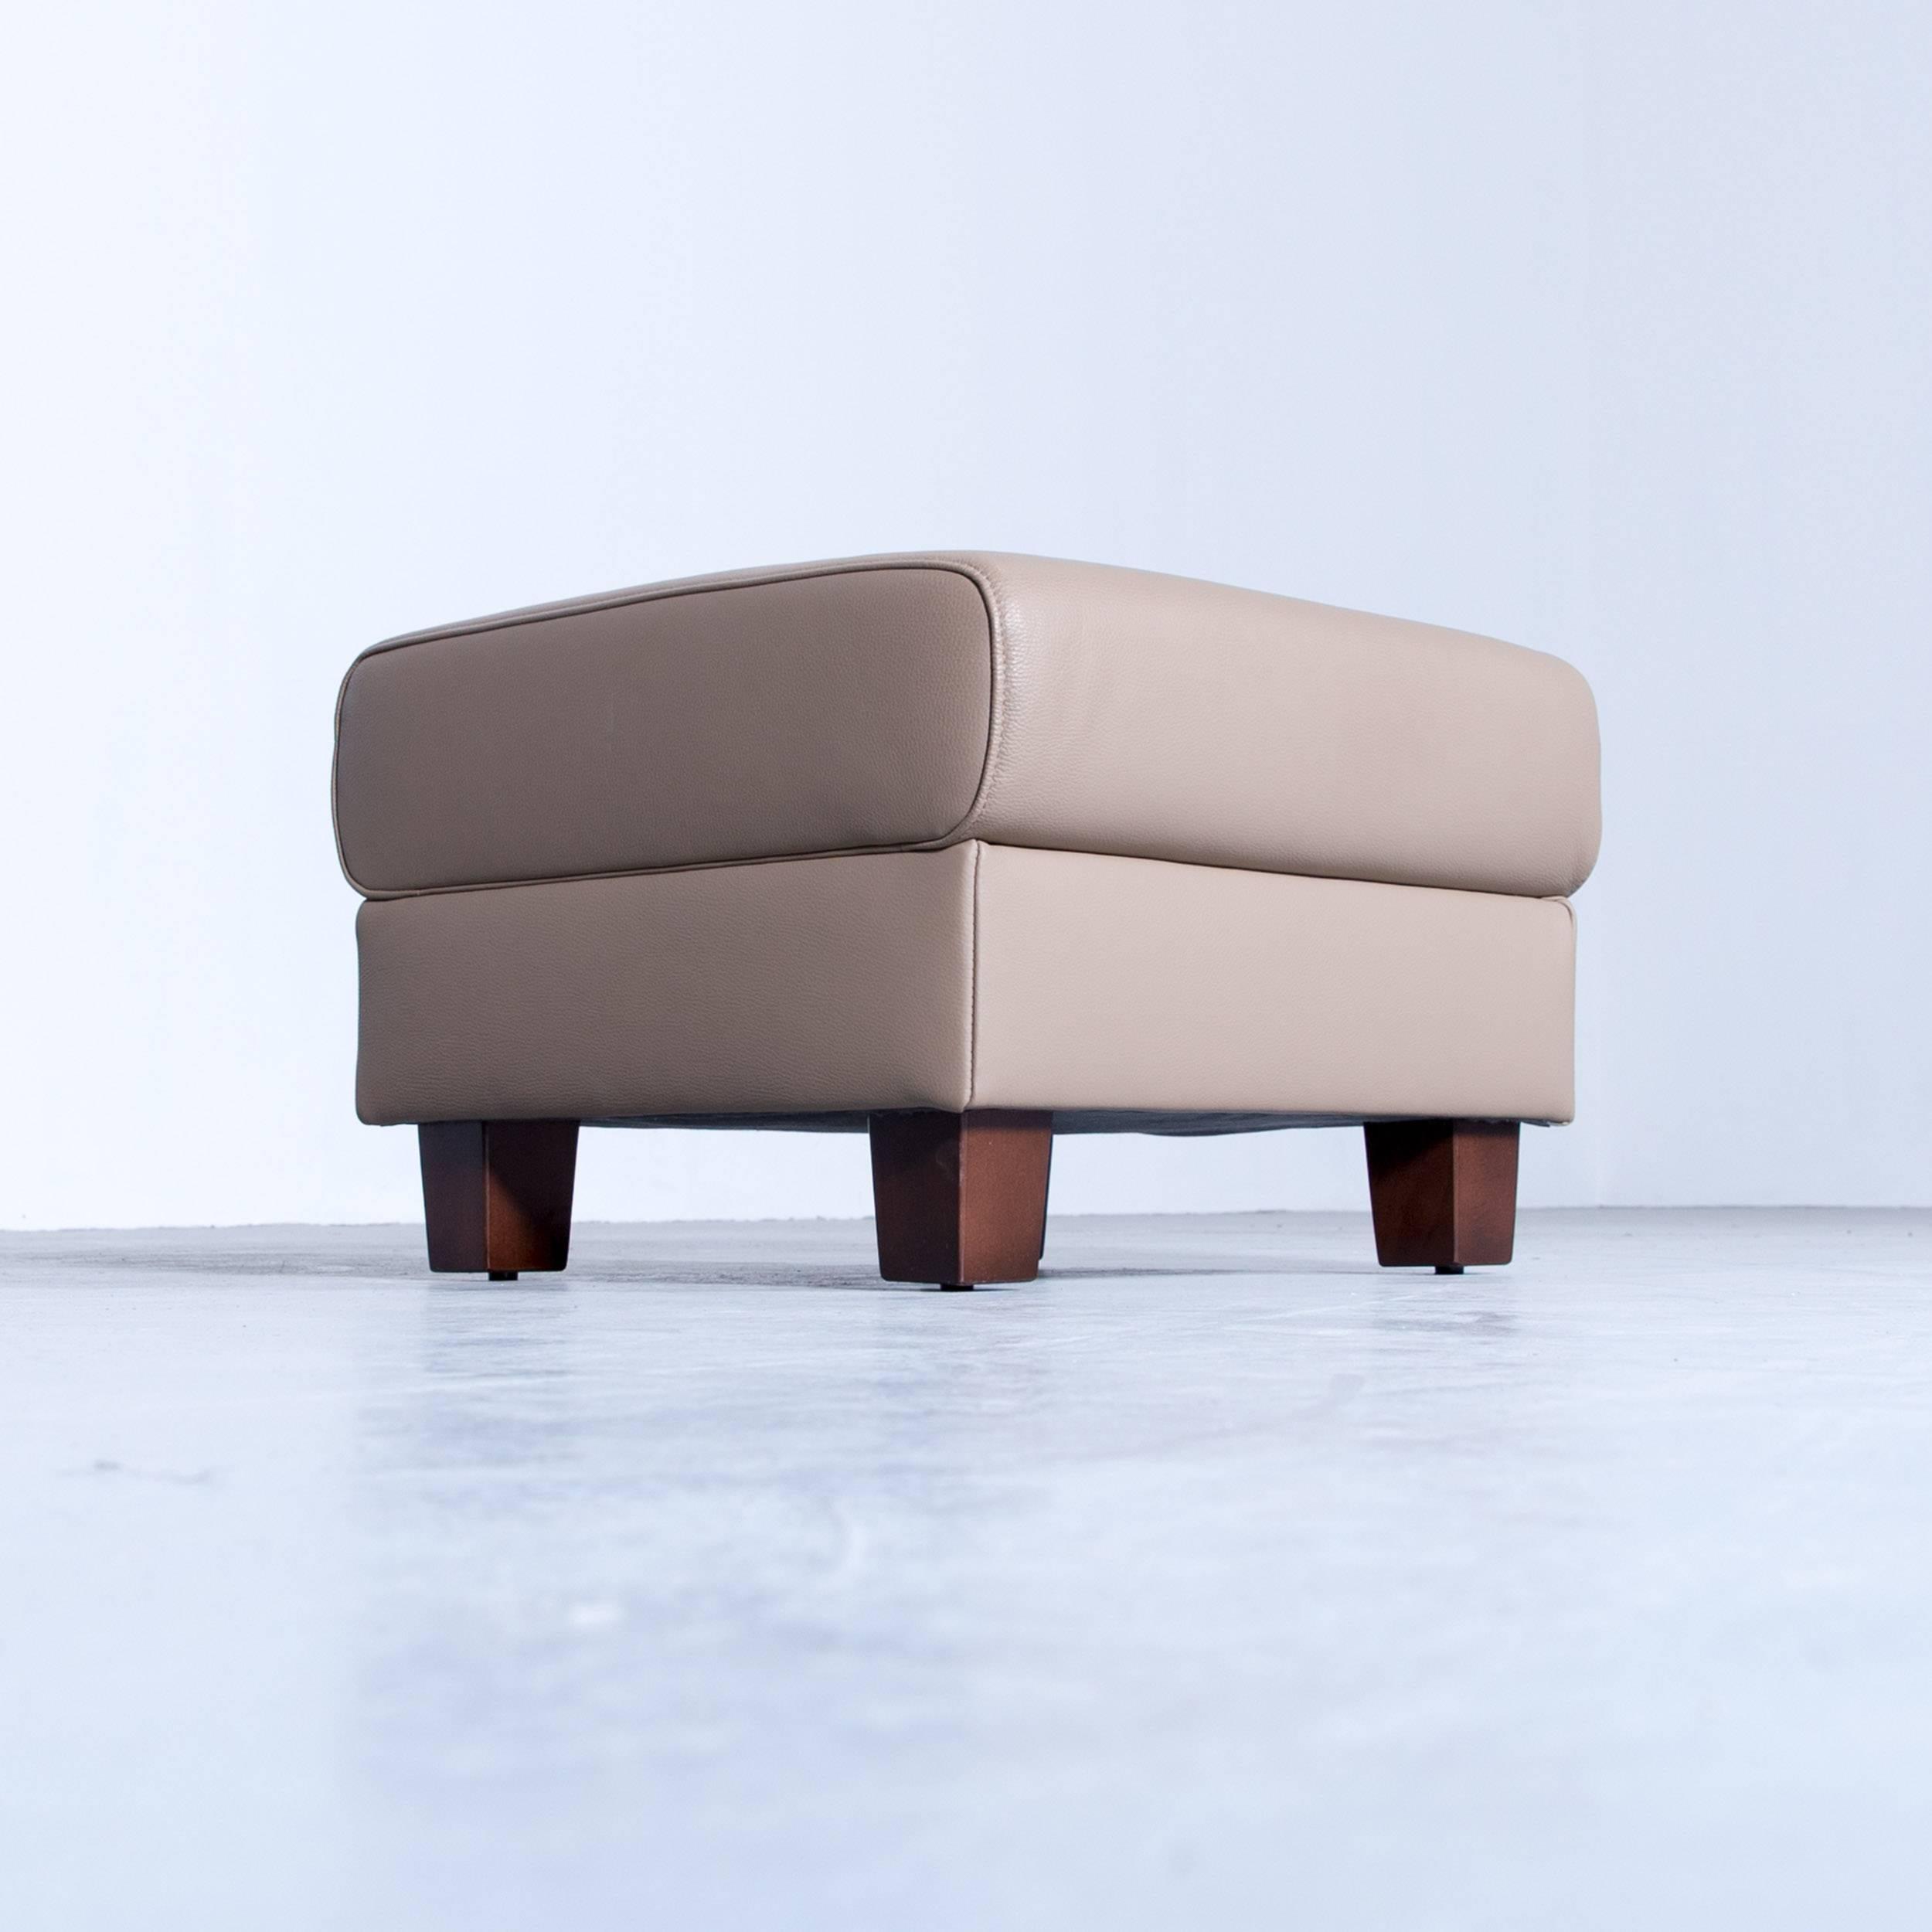 Akau0027dor Designer Footstool Leather Beige Brown Modern Footrest Wooden Feet  In Excellent Condition For